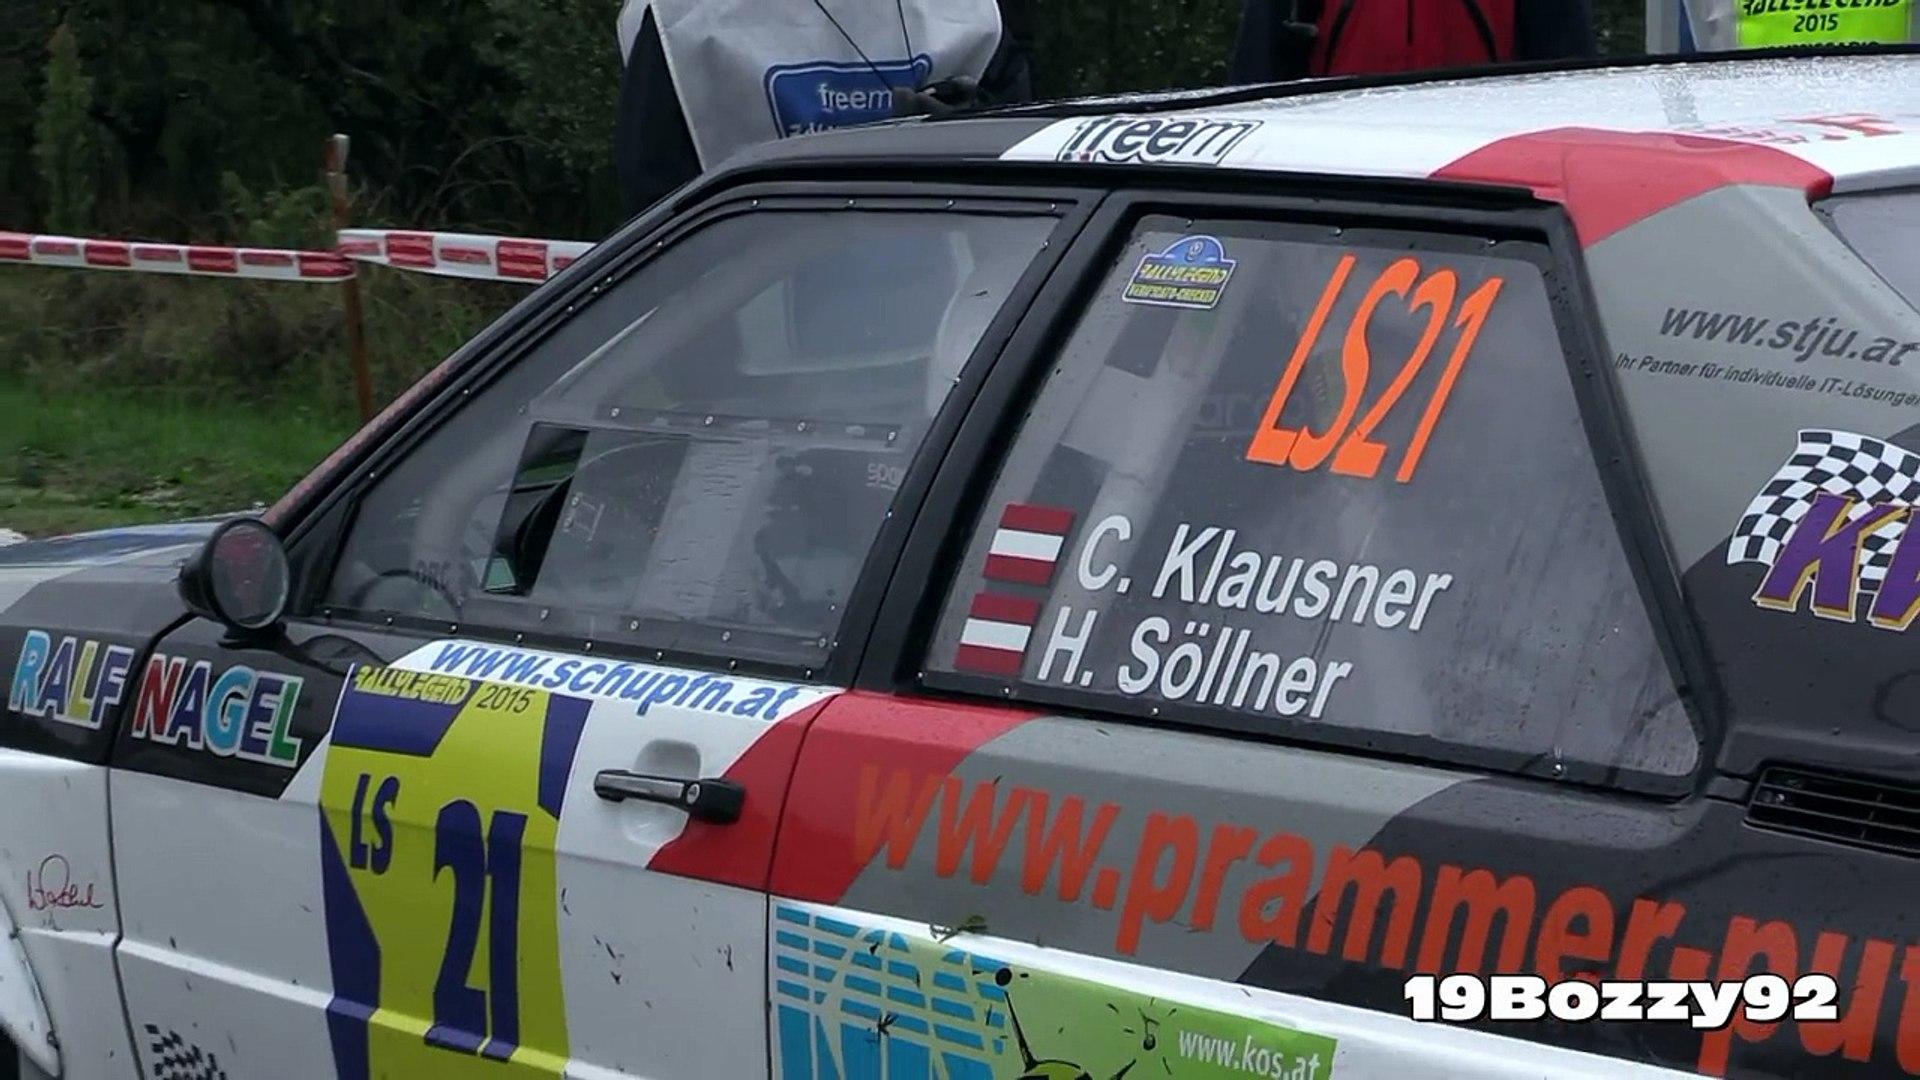 Audi Quattro Sound & Flames - Christof Klausner Show at Rally Legend